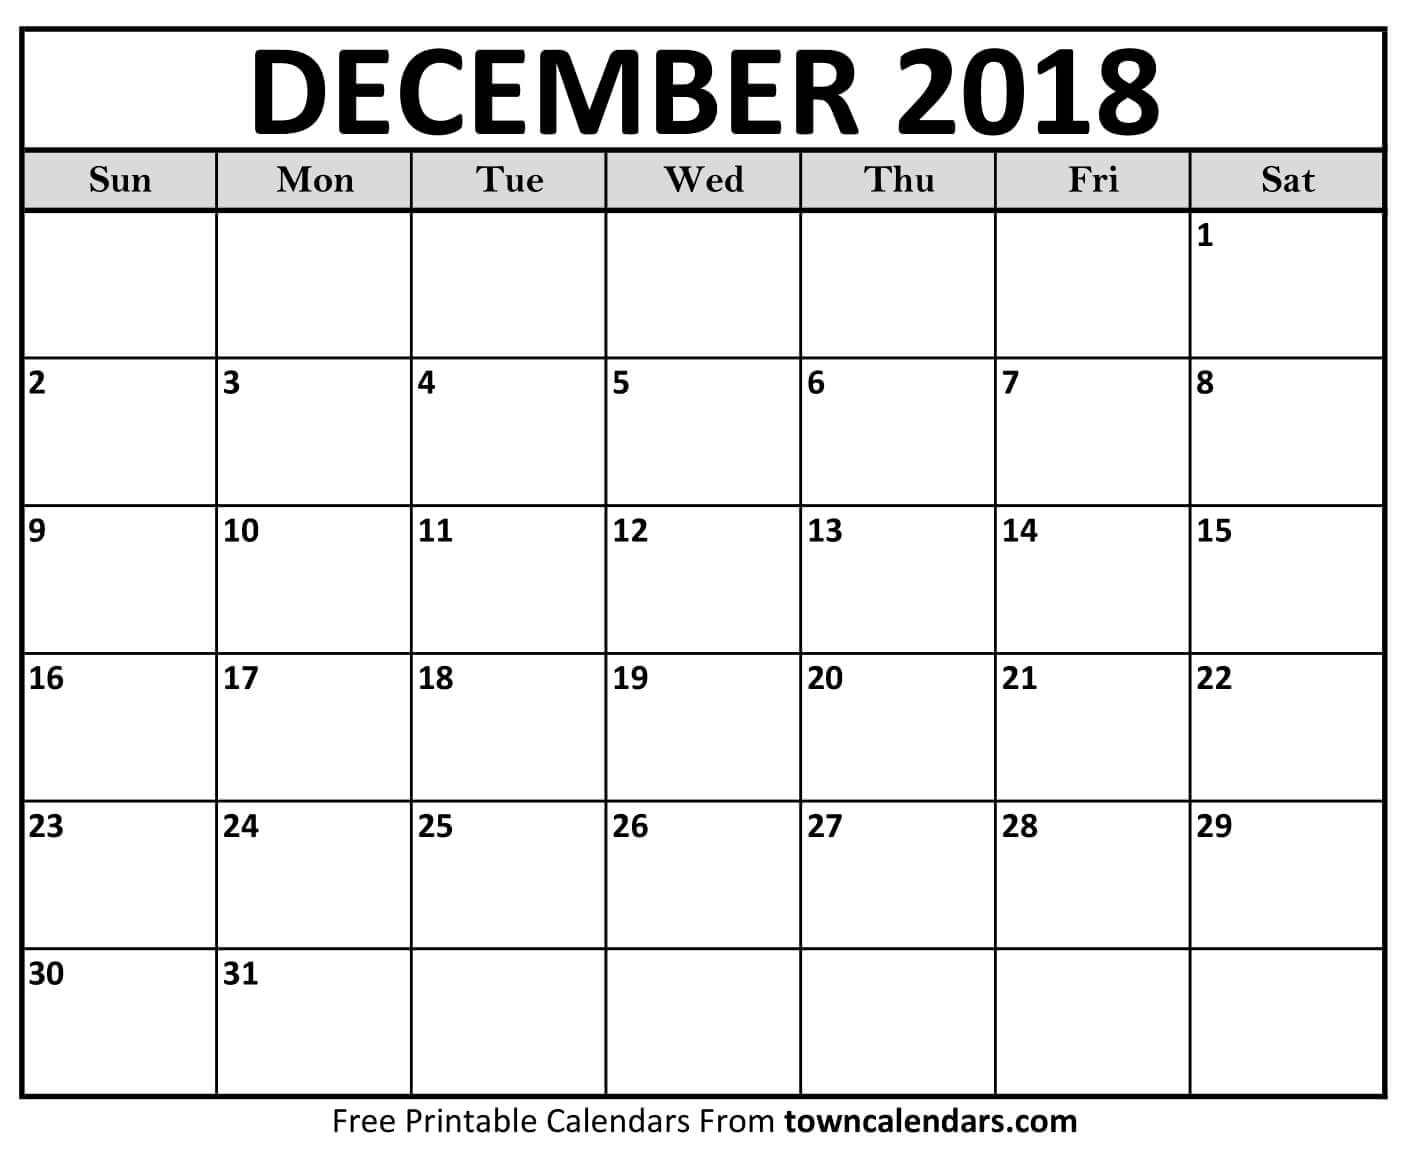 Printable 2018 December Calendar Template - Printable Calendar 2019 for Blank Printable Calendars December